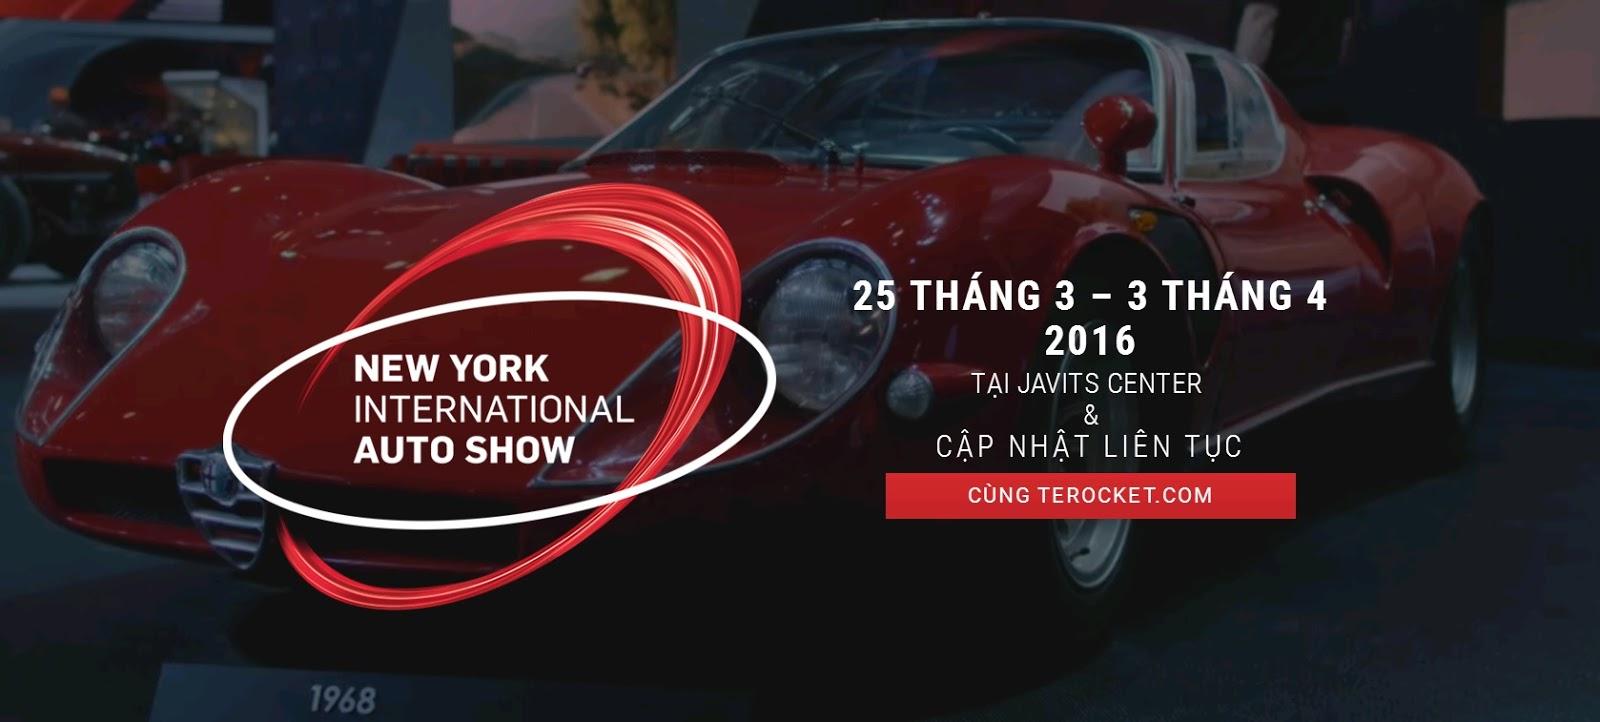 New York Auto Show 2016 từ A đến Z